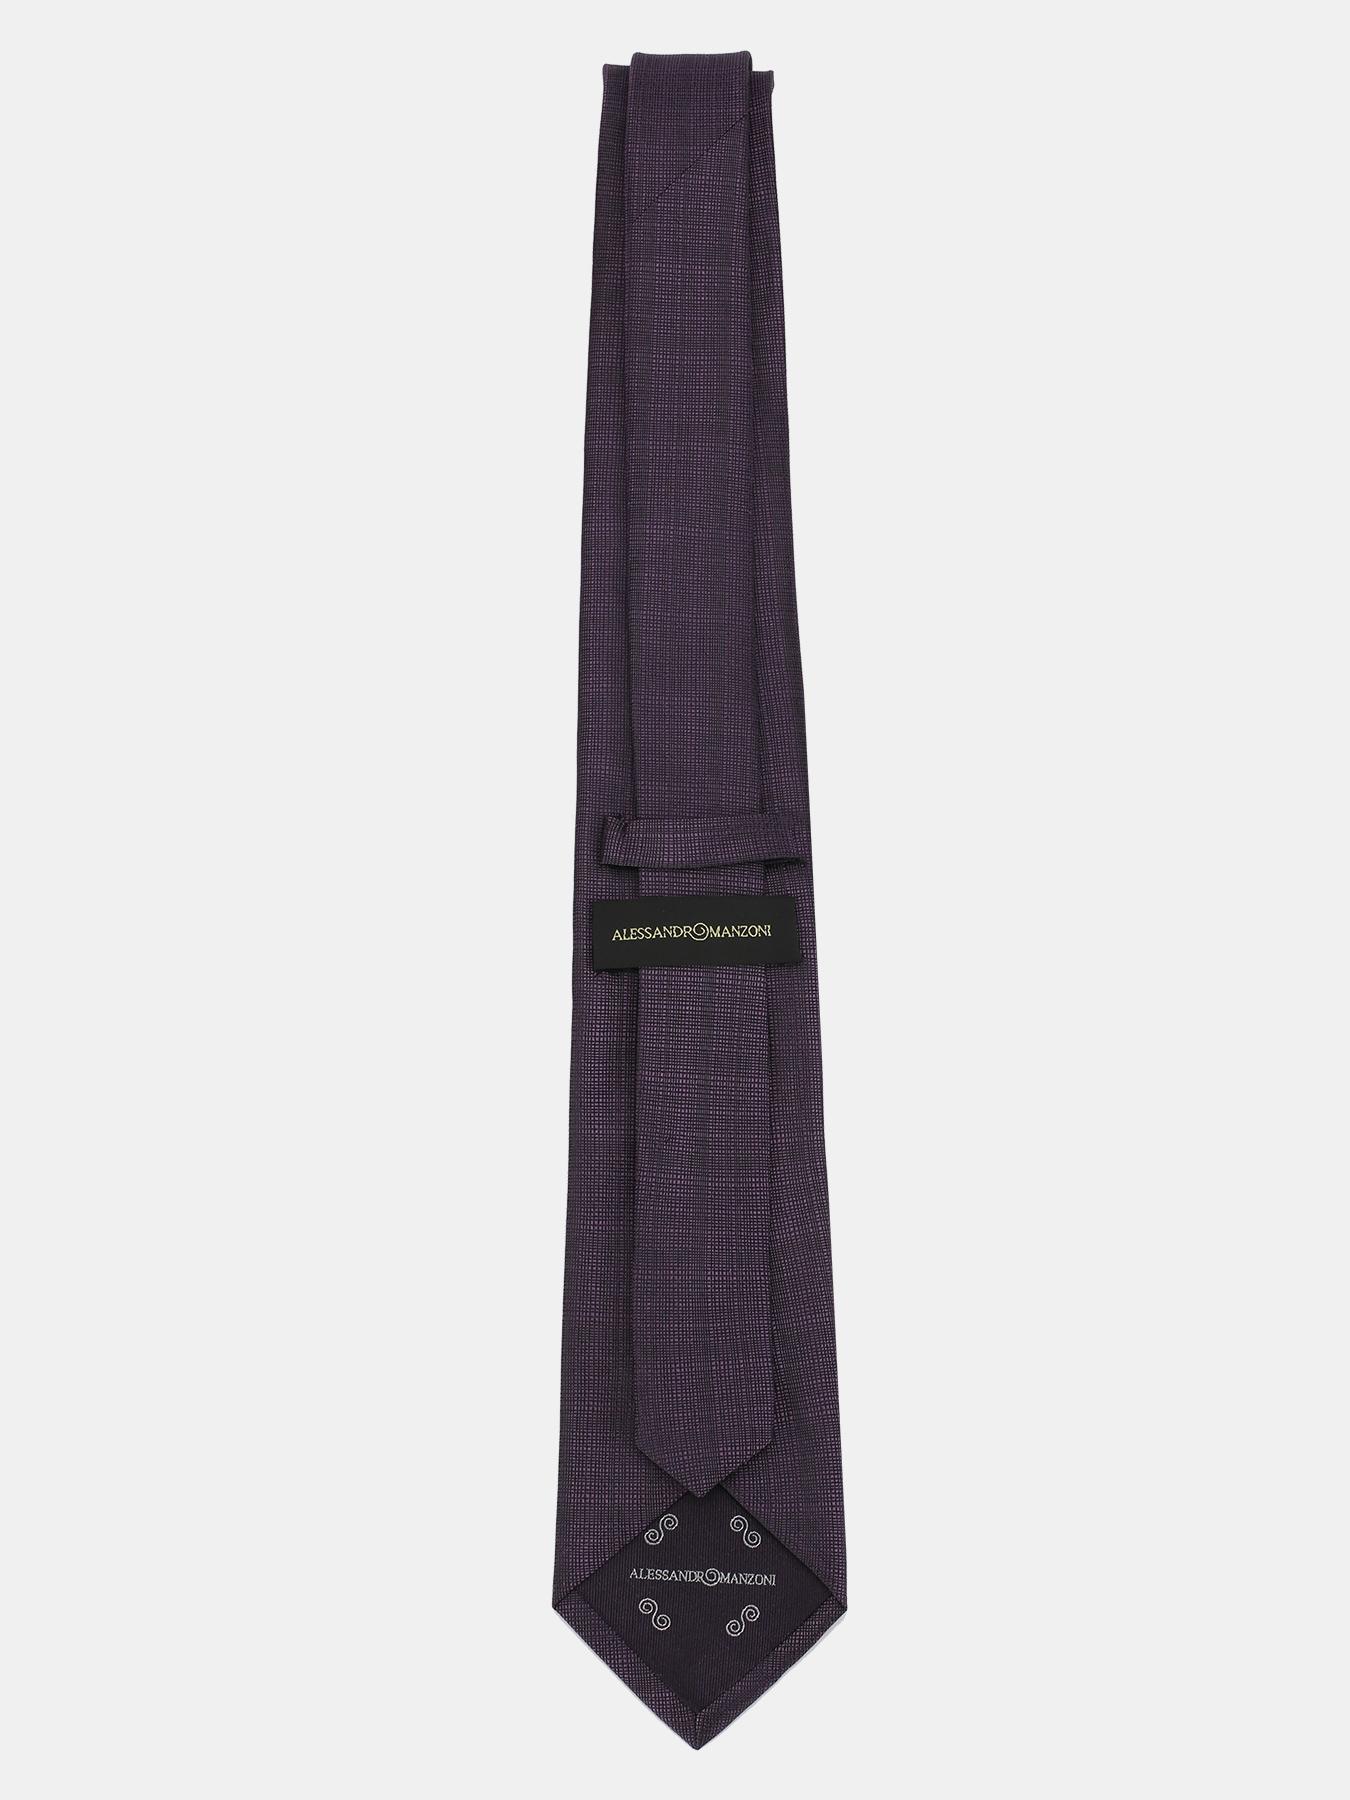 Alessandro Manzoni Шелковый галстук 312357-185 Фото 2